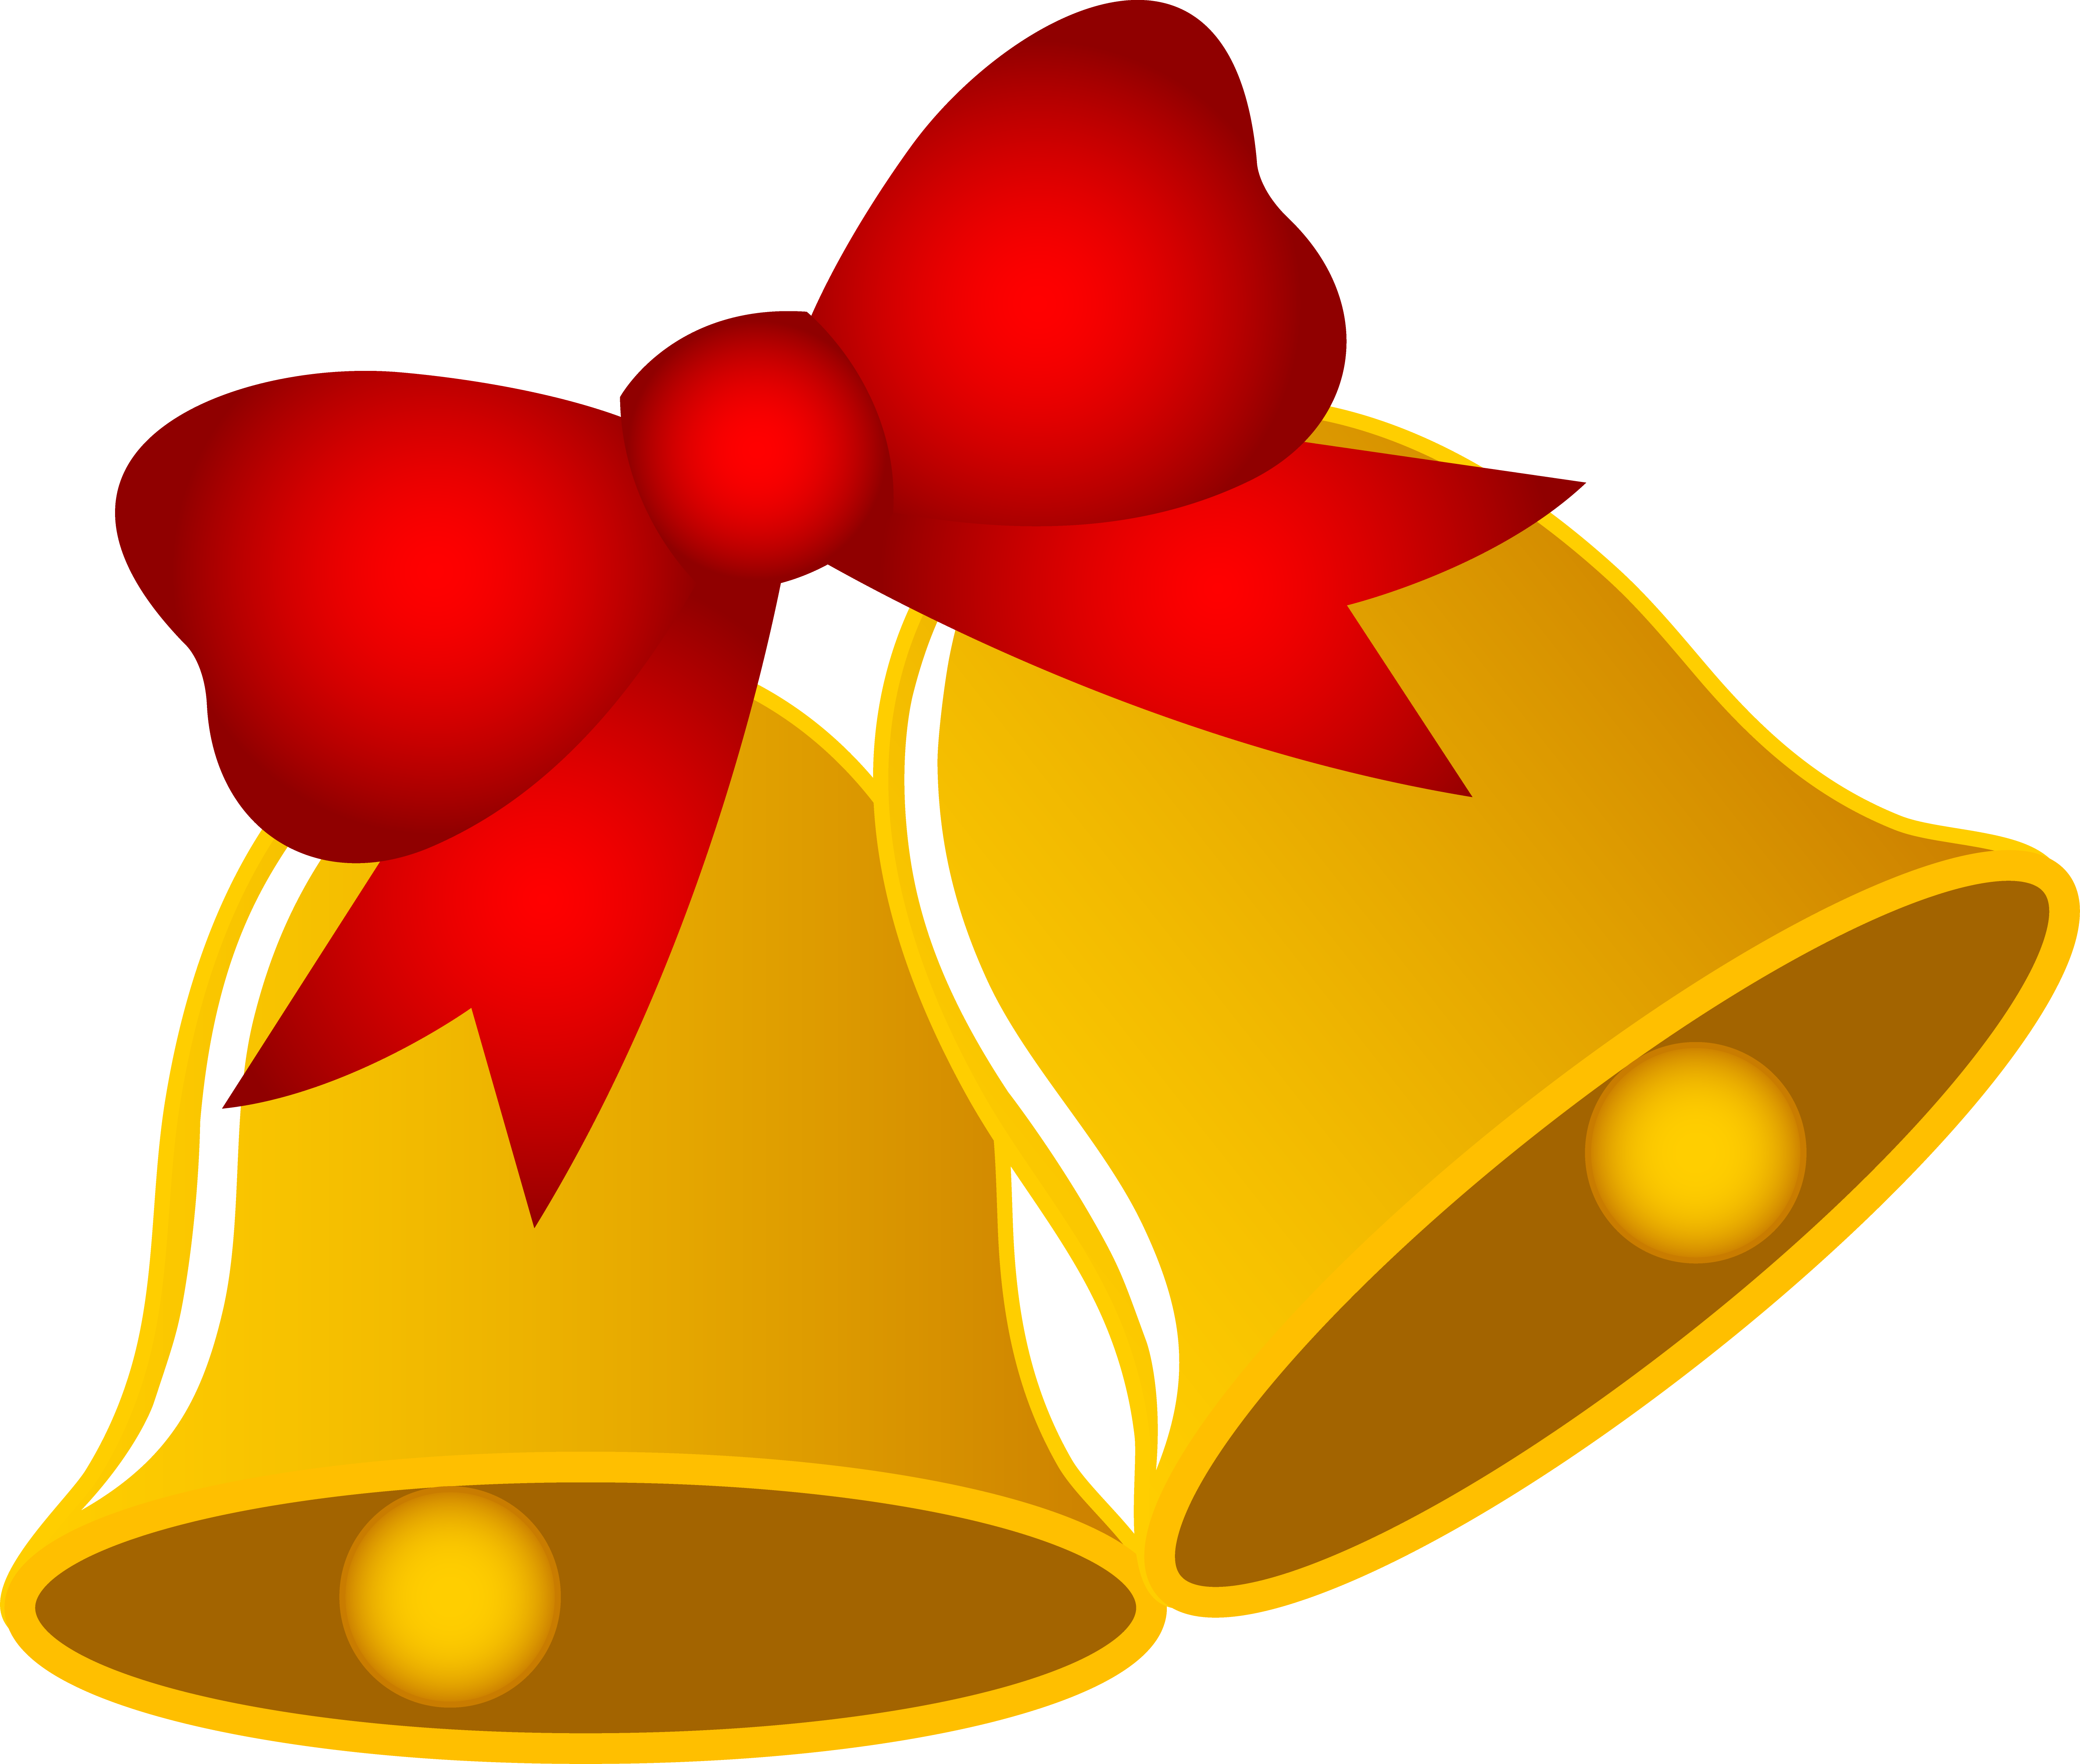 christmas bells clip art clipart panda free clipart images rh clipartpanda com christmas bells clipart free Candy Cane Clip Art